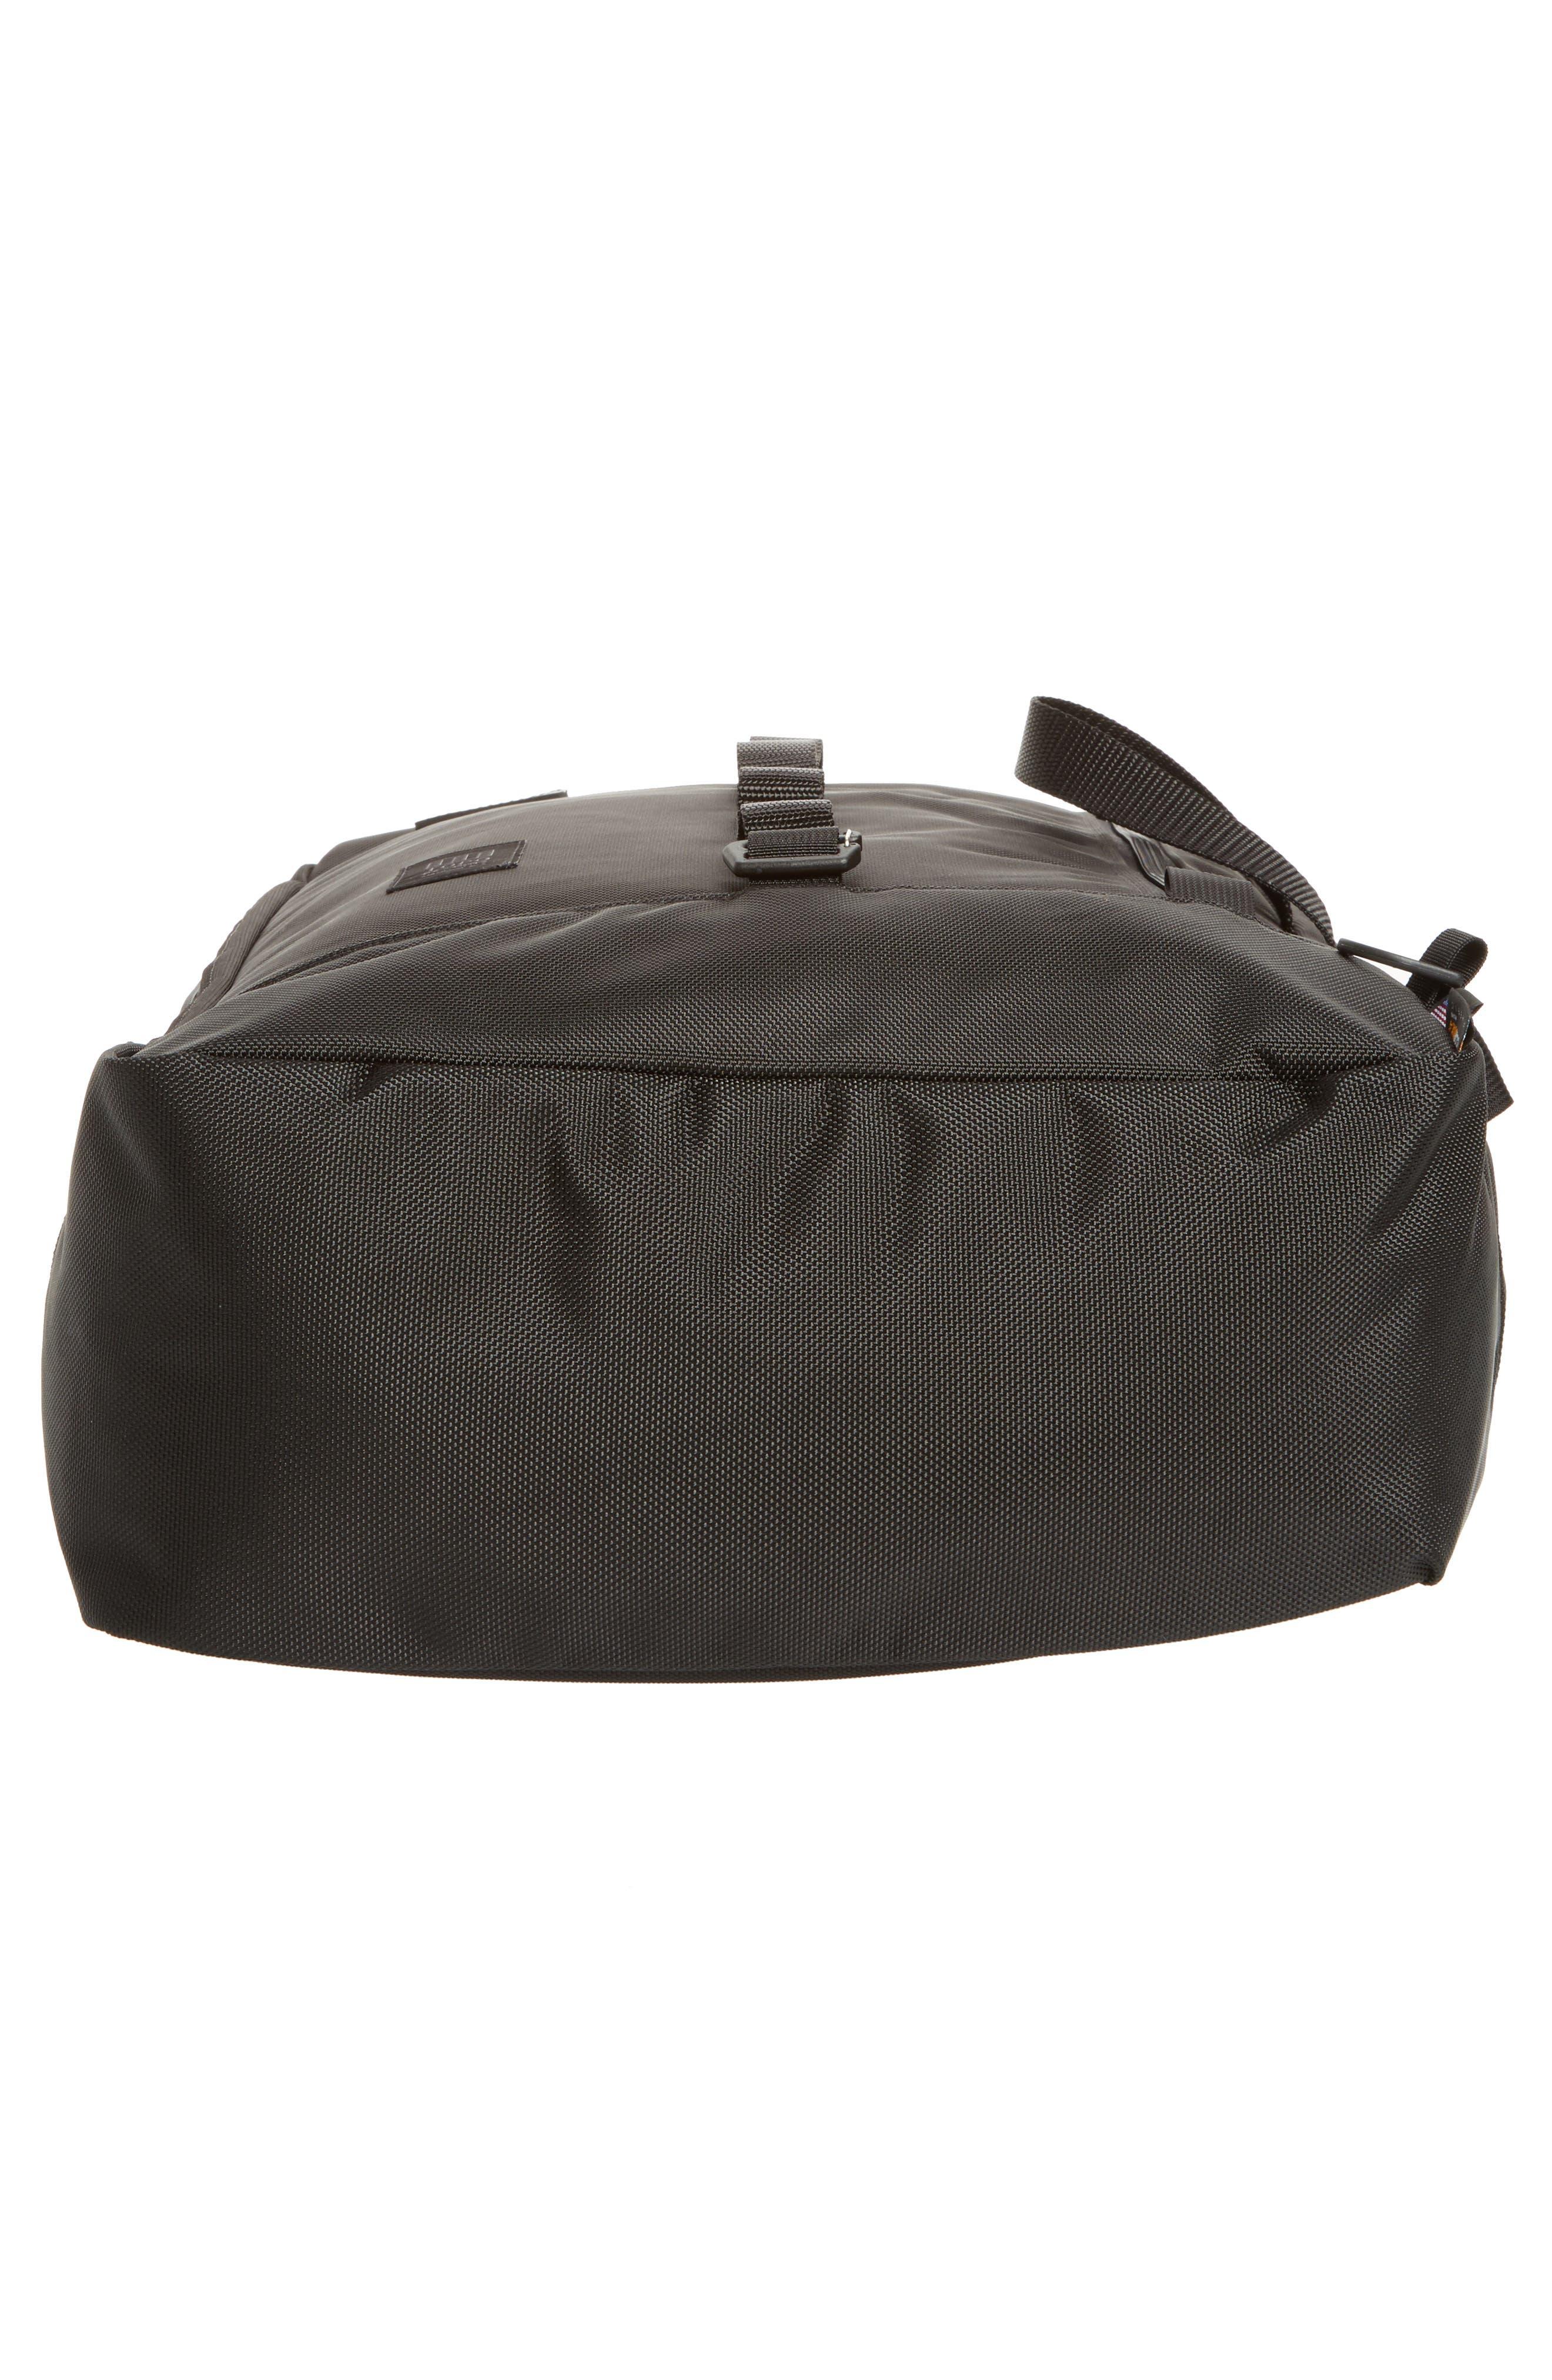 Travel Backpack,                             Alternate thumbnail 6, color,                             BALLISTIC BLACK